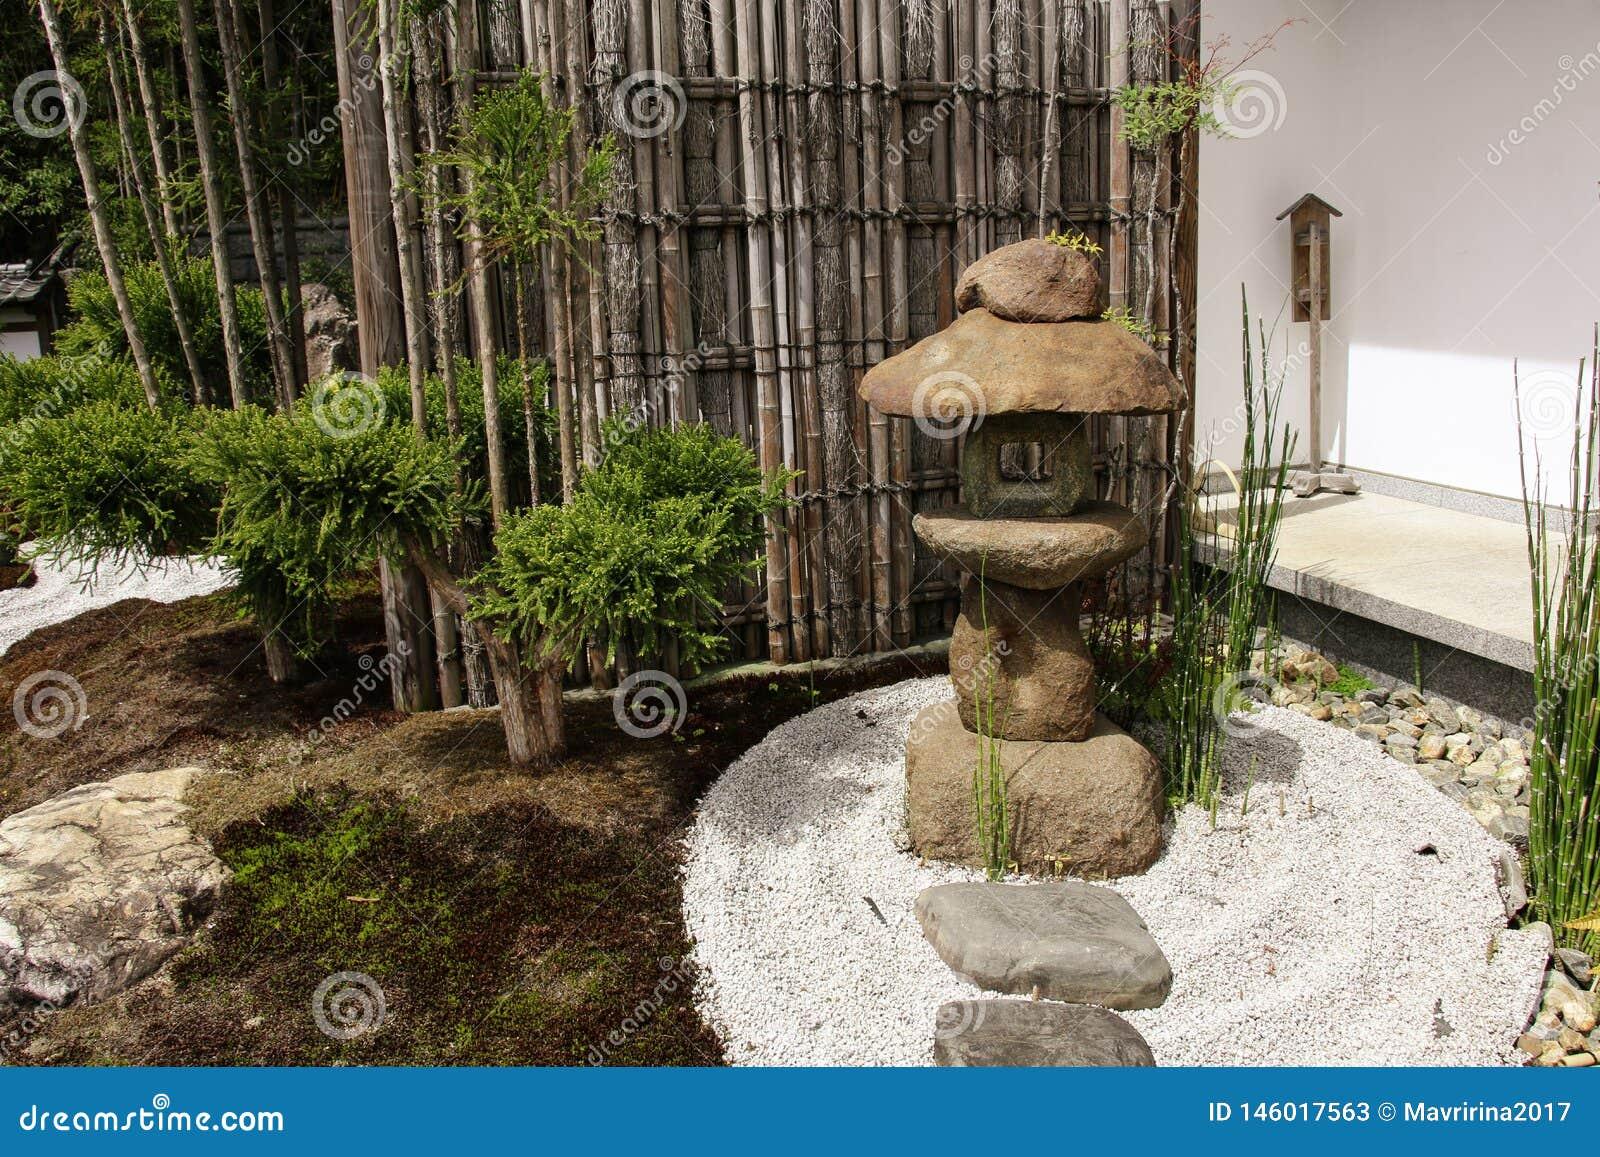 Stone Lantern And Bamboo Partition In Traditional Japanese Zen Garden In Hasedera Kamakura Japan Stock Image Image Of Japan Buddhist 146017563